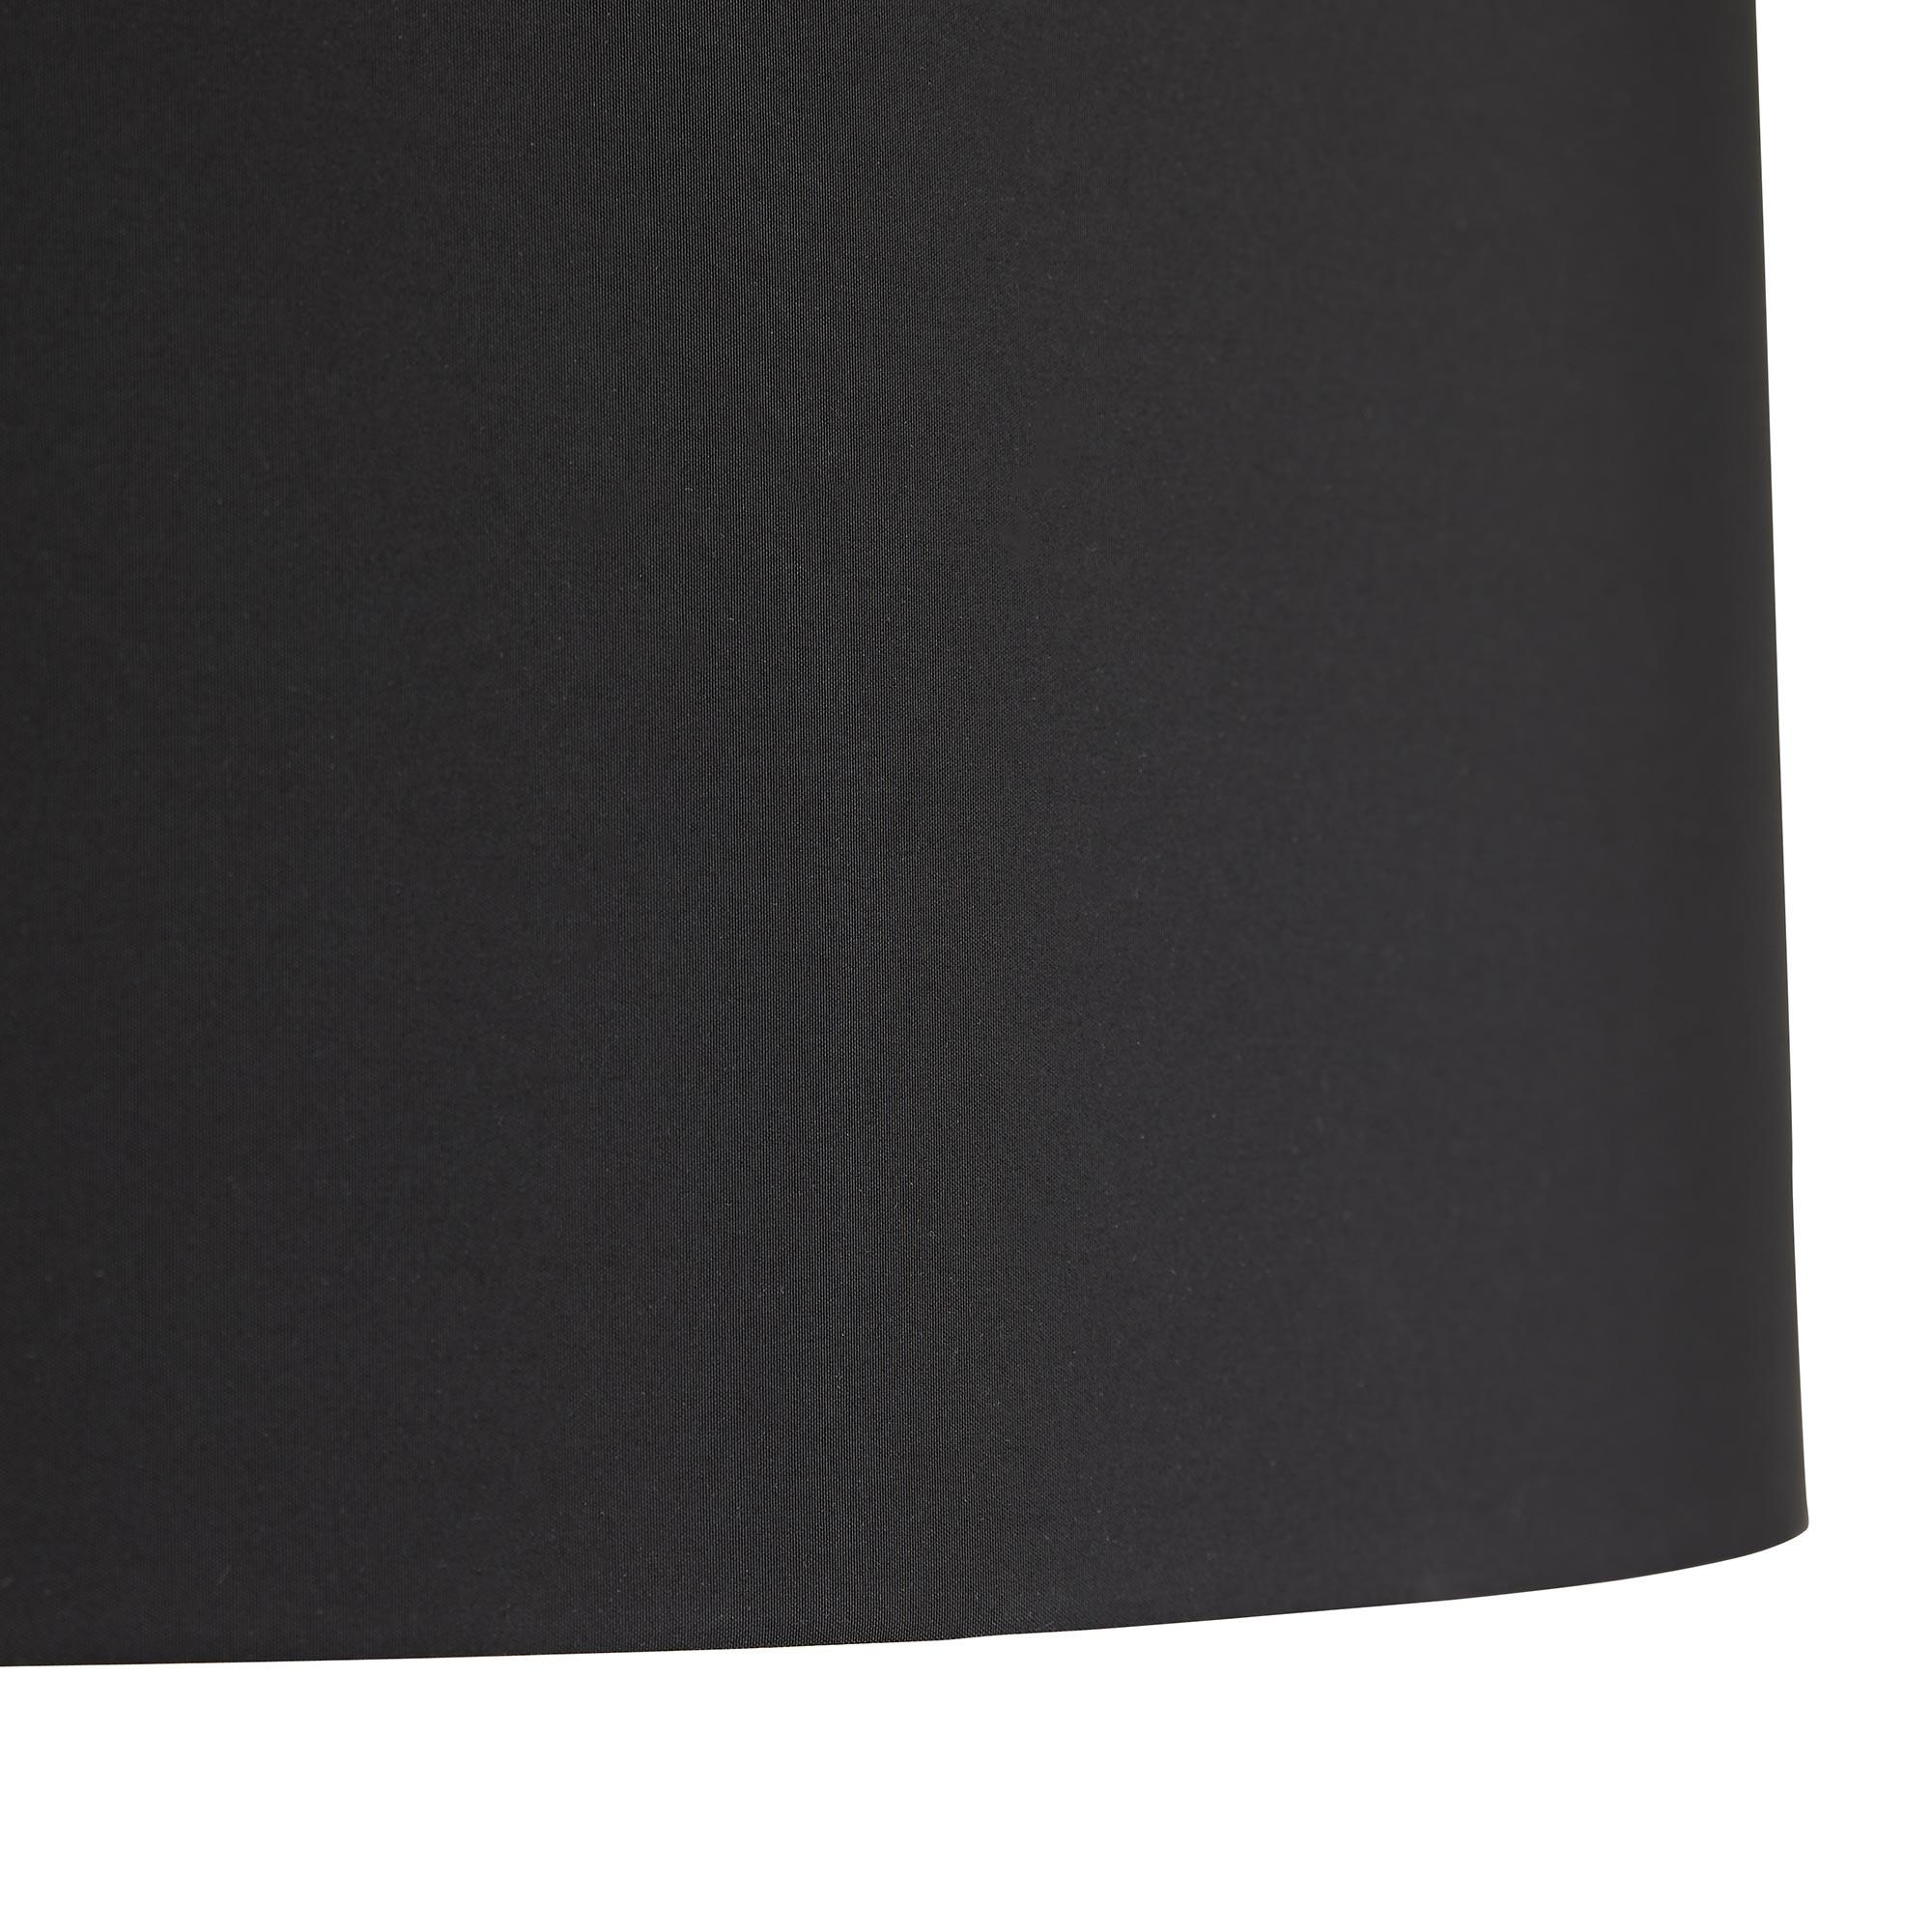 Haley Brass & Silver Floor Lamp | Black Shade